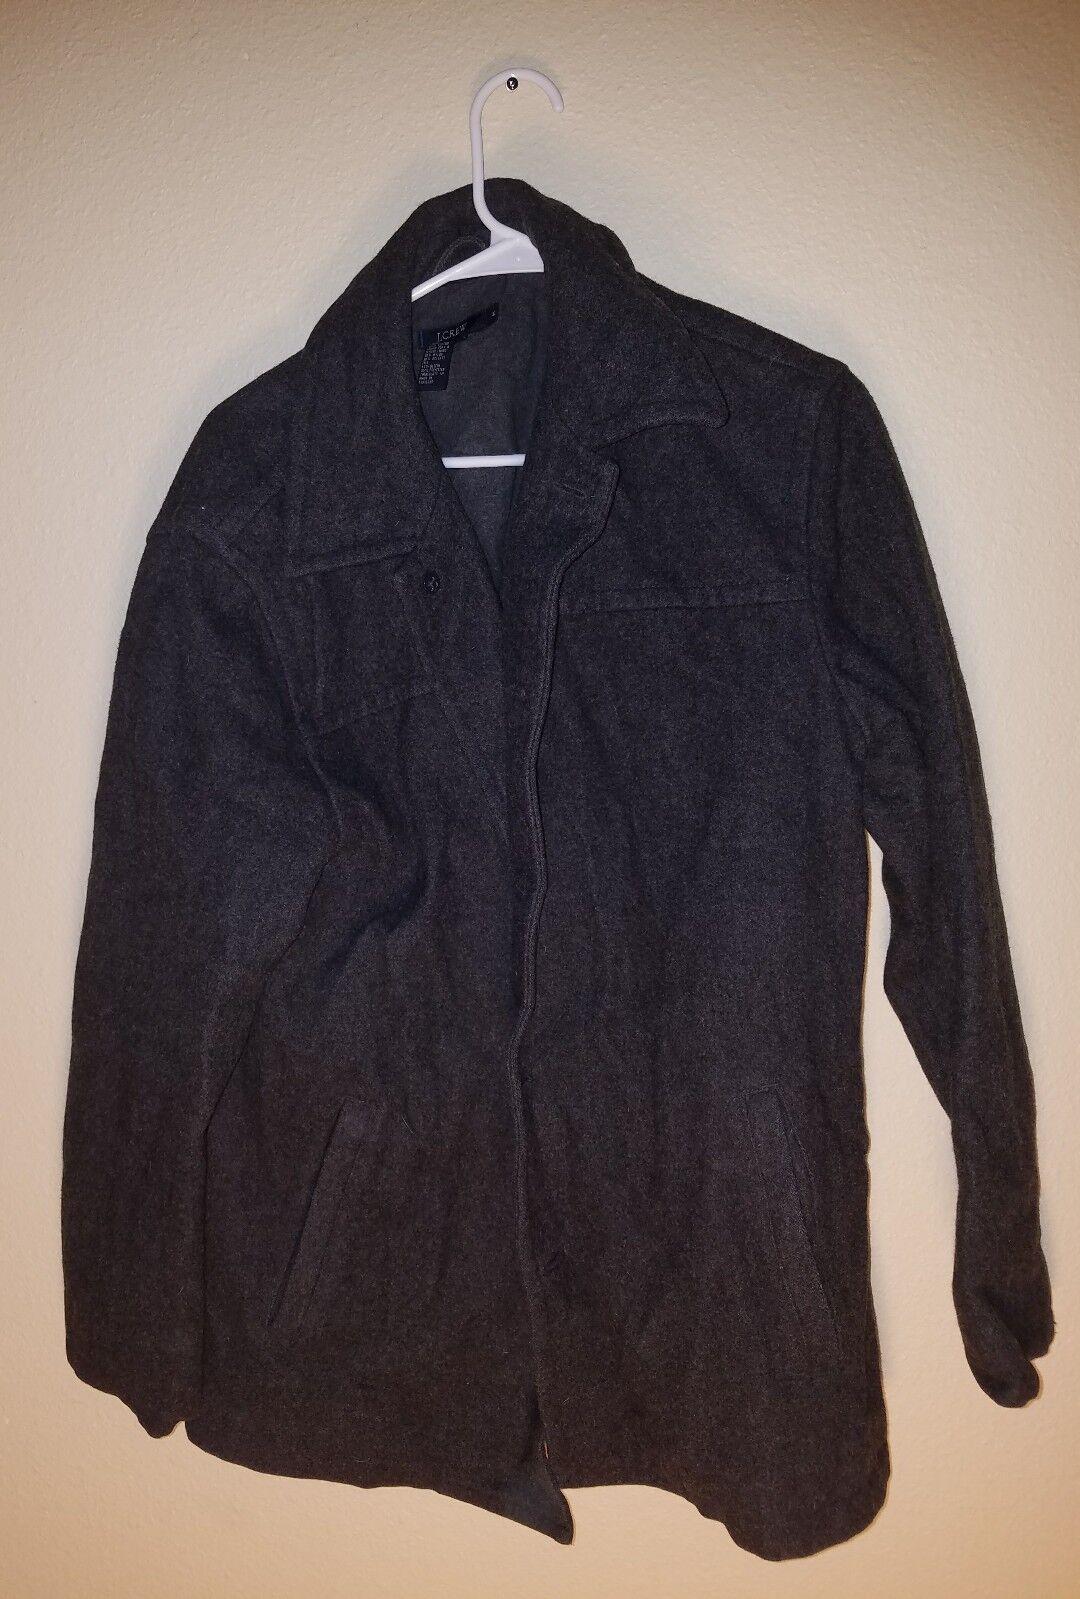 J.Crew Wool Blend University coat item 96037 235 Men Größe Medium M